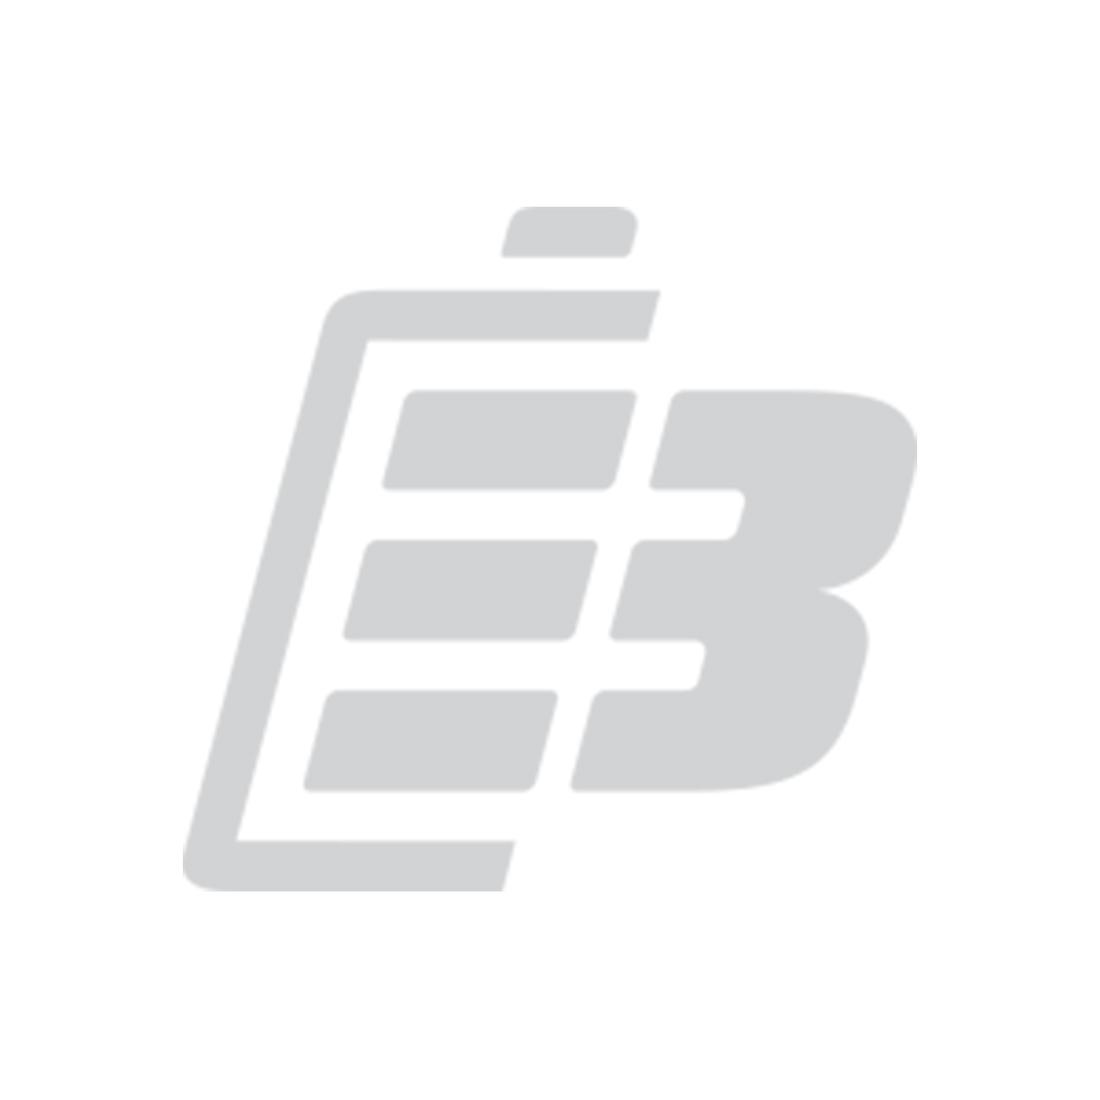 PDA battery Acer Treo 600_1